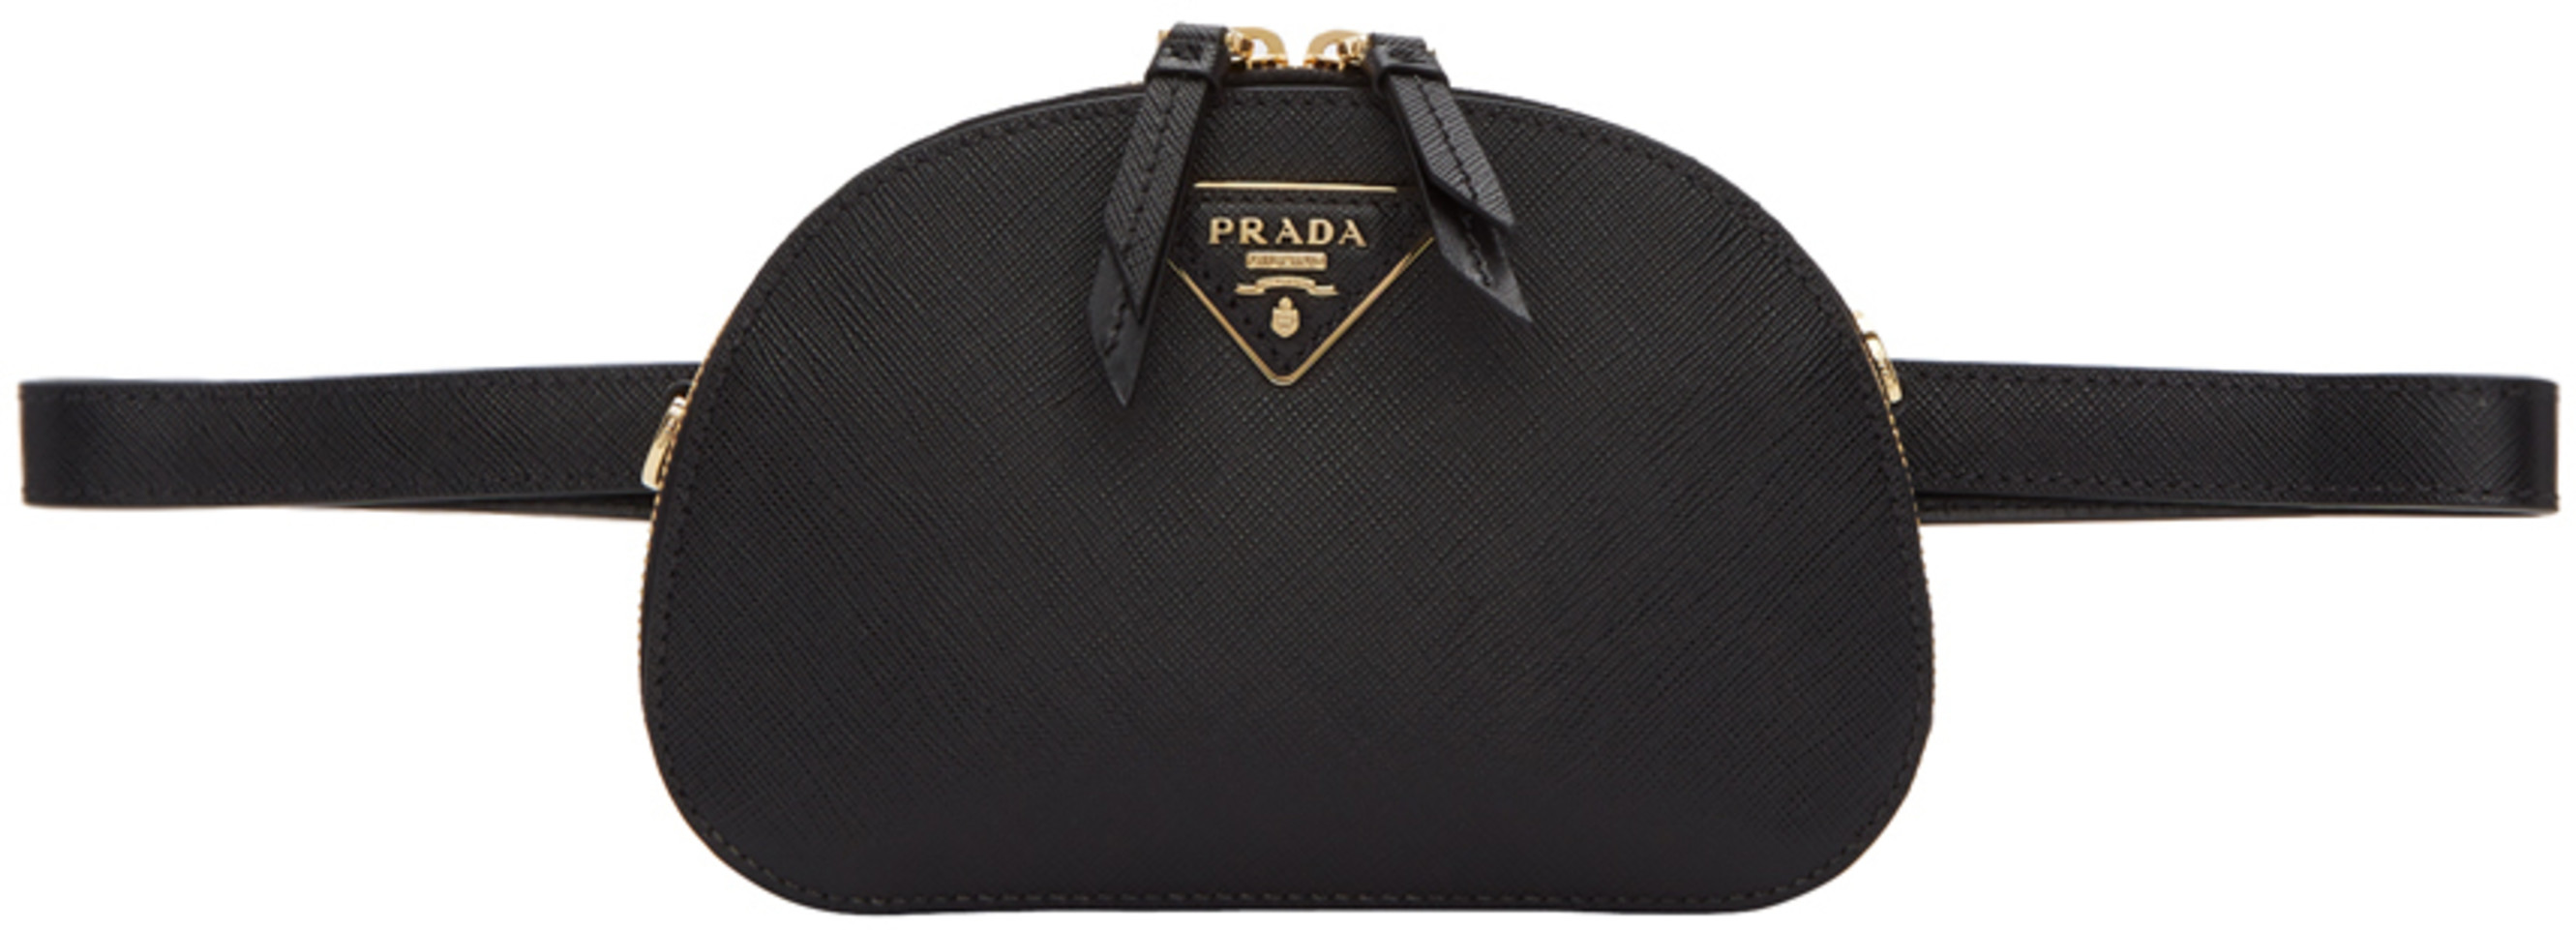 5fb41ac0c13 Prada bags for Women | SSENSE